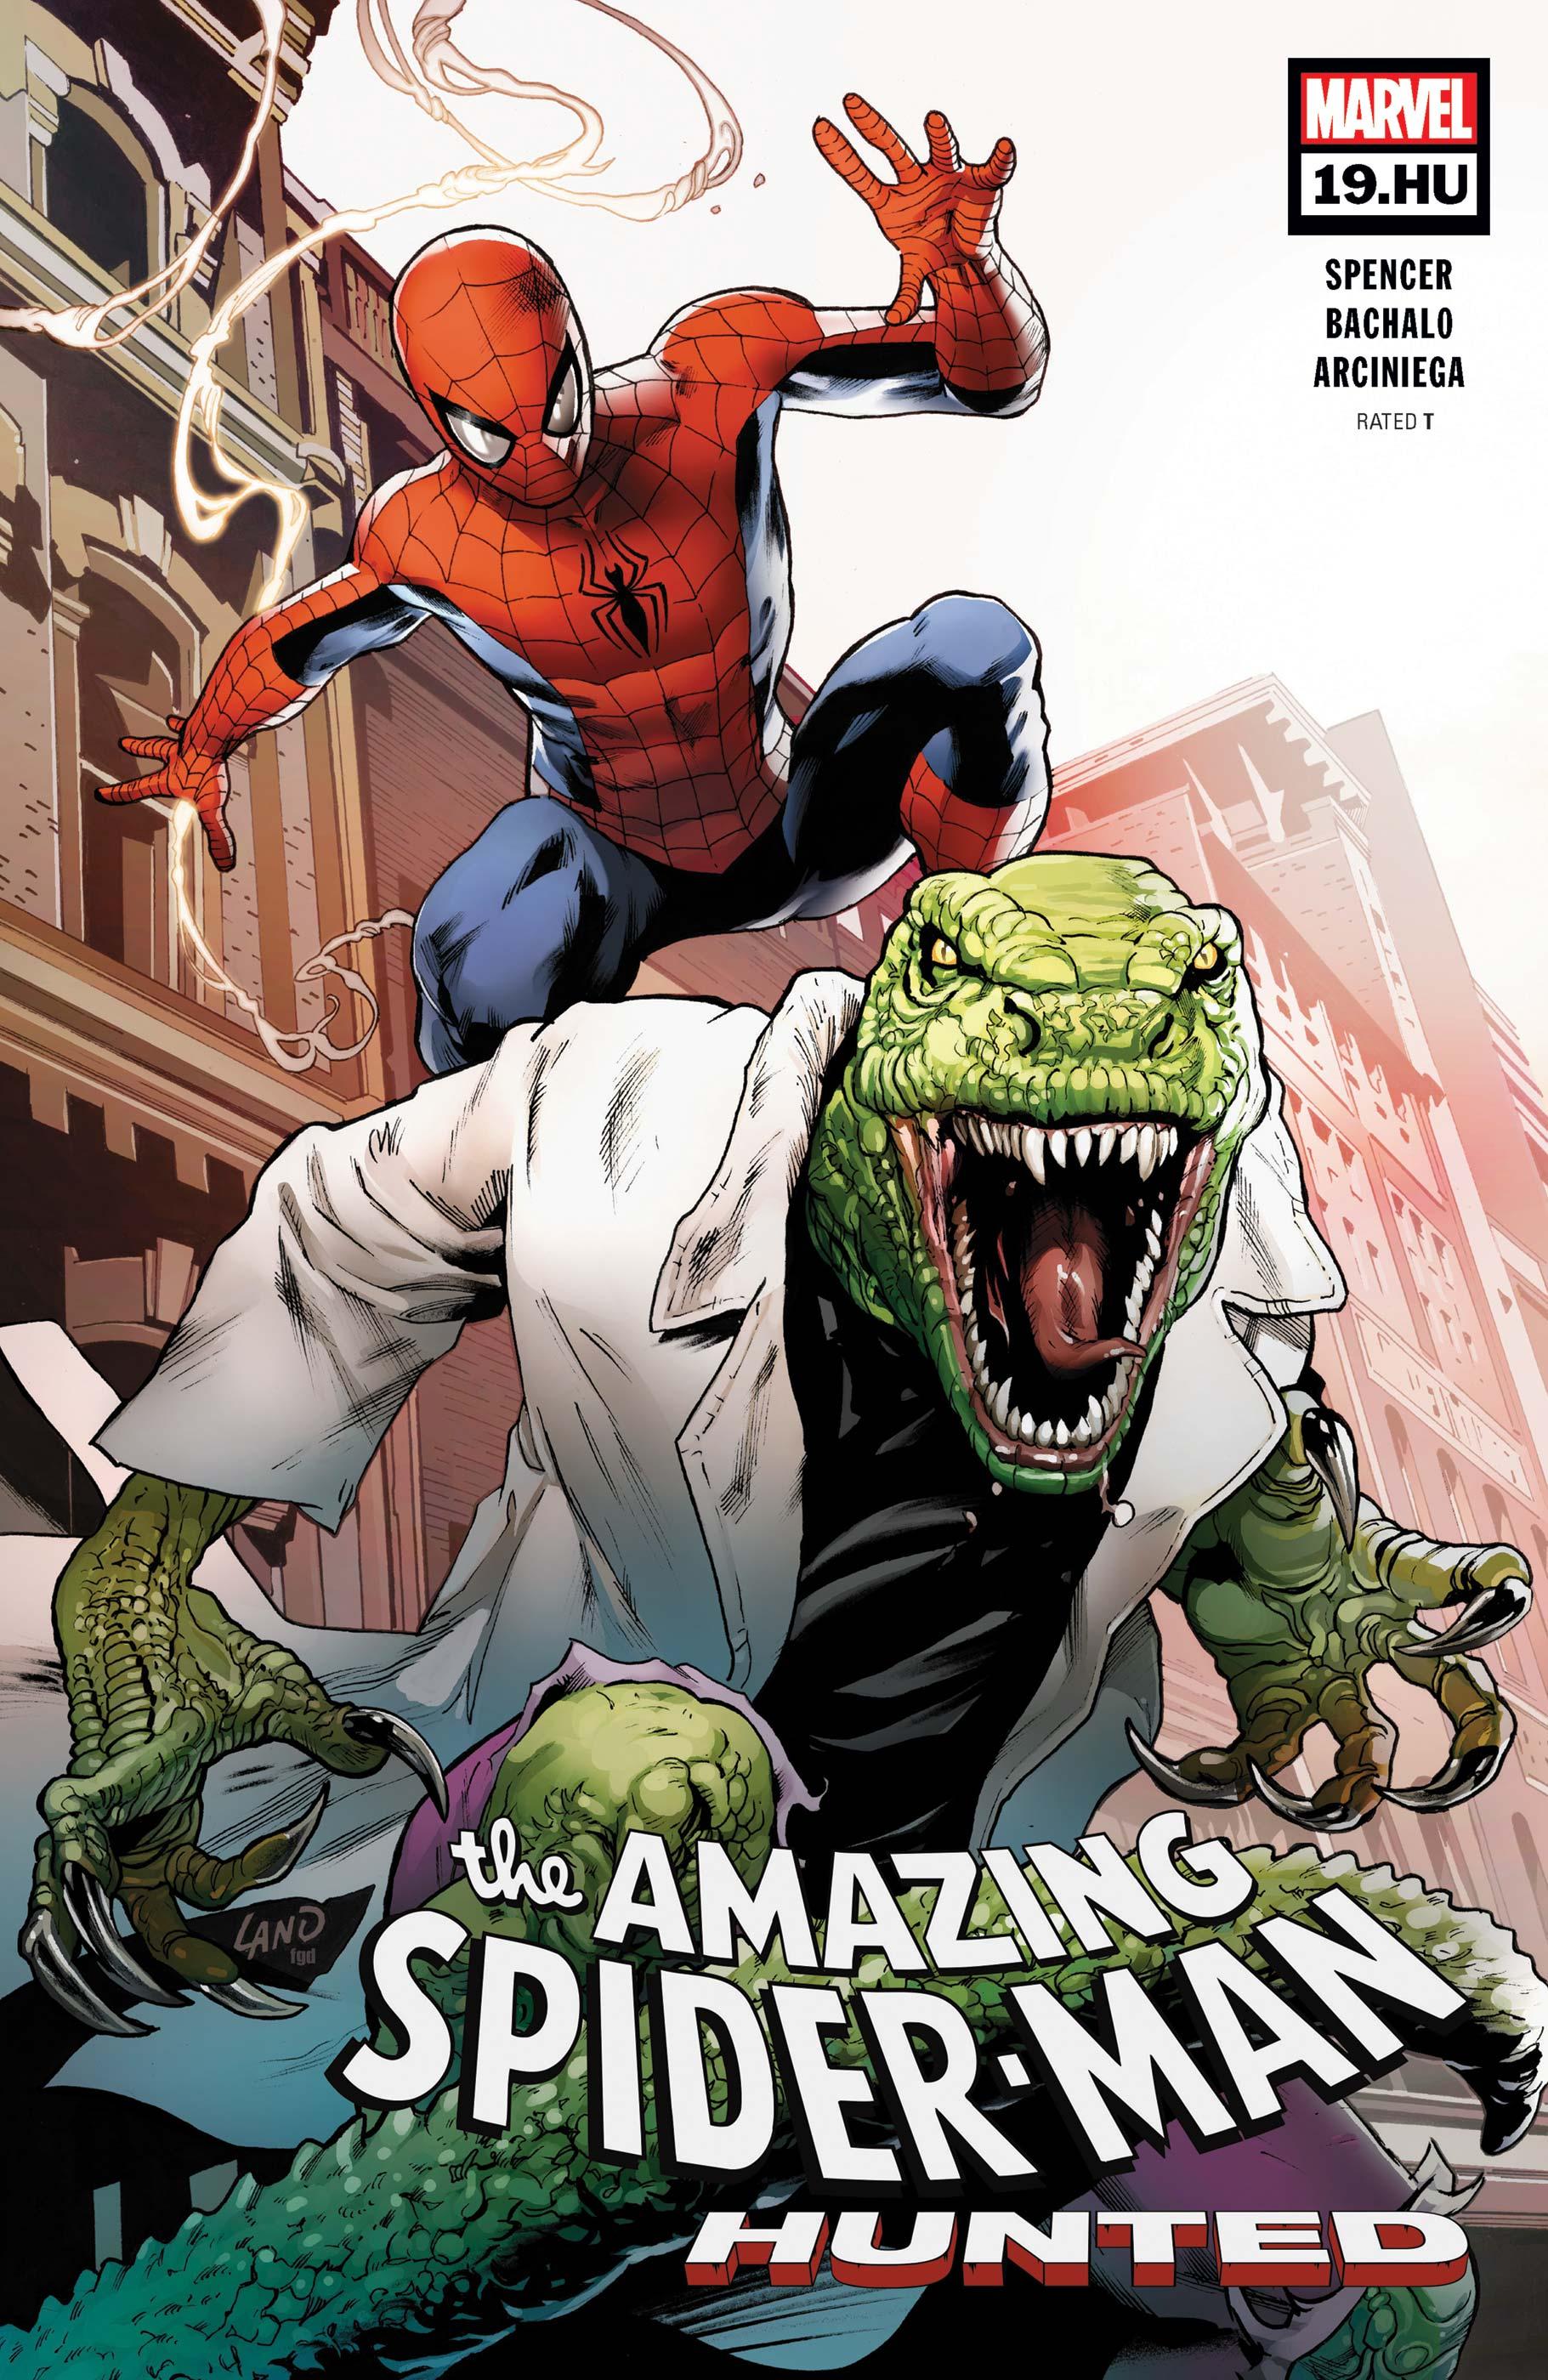 The Amazing Spider-Man (2018) #19.1